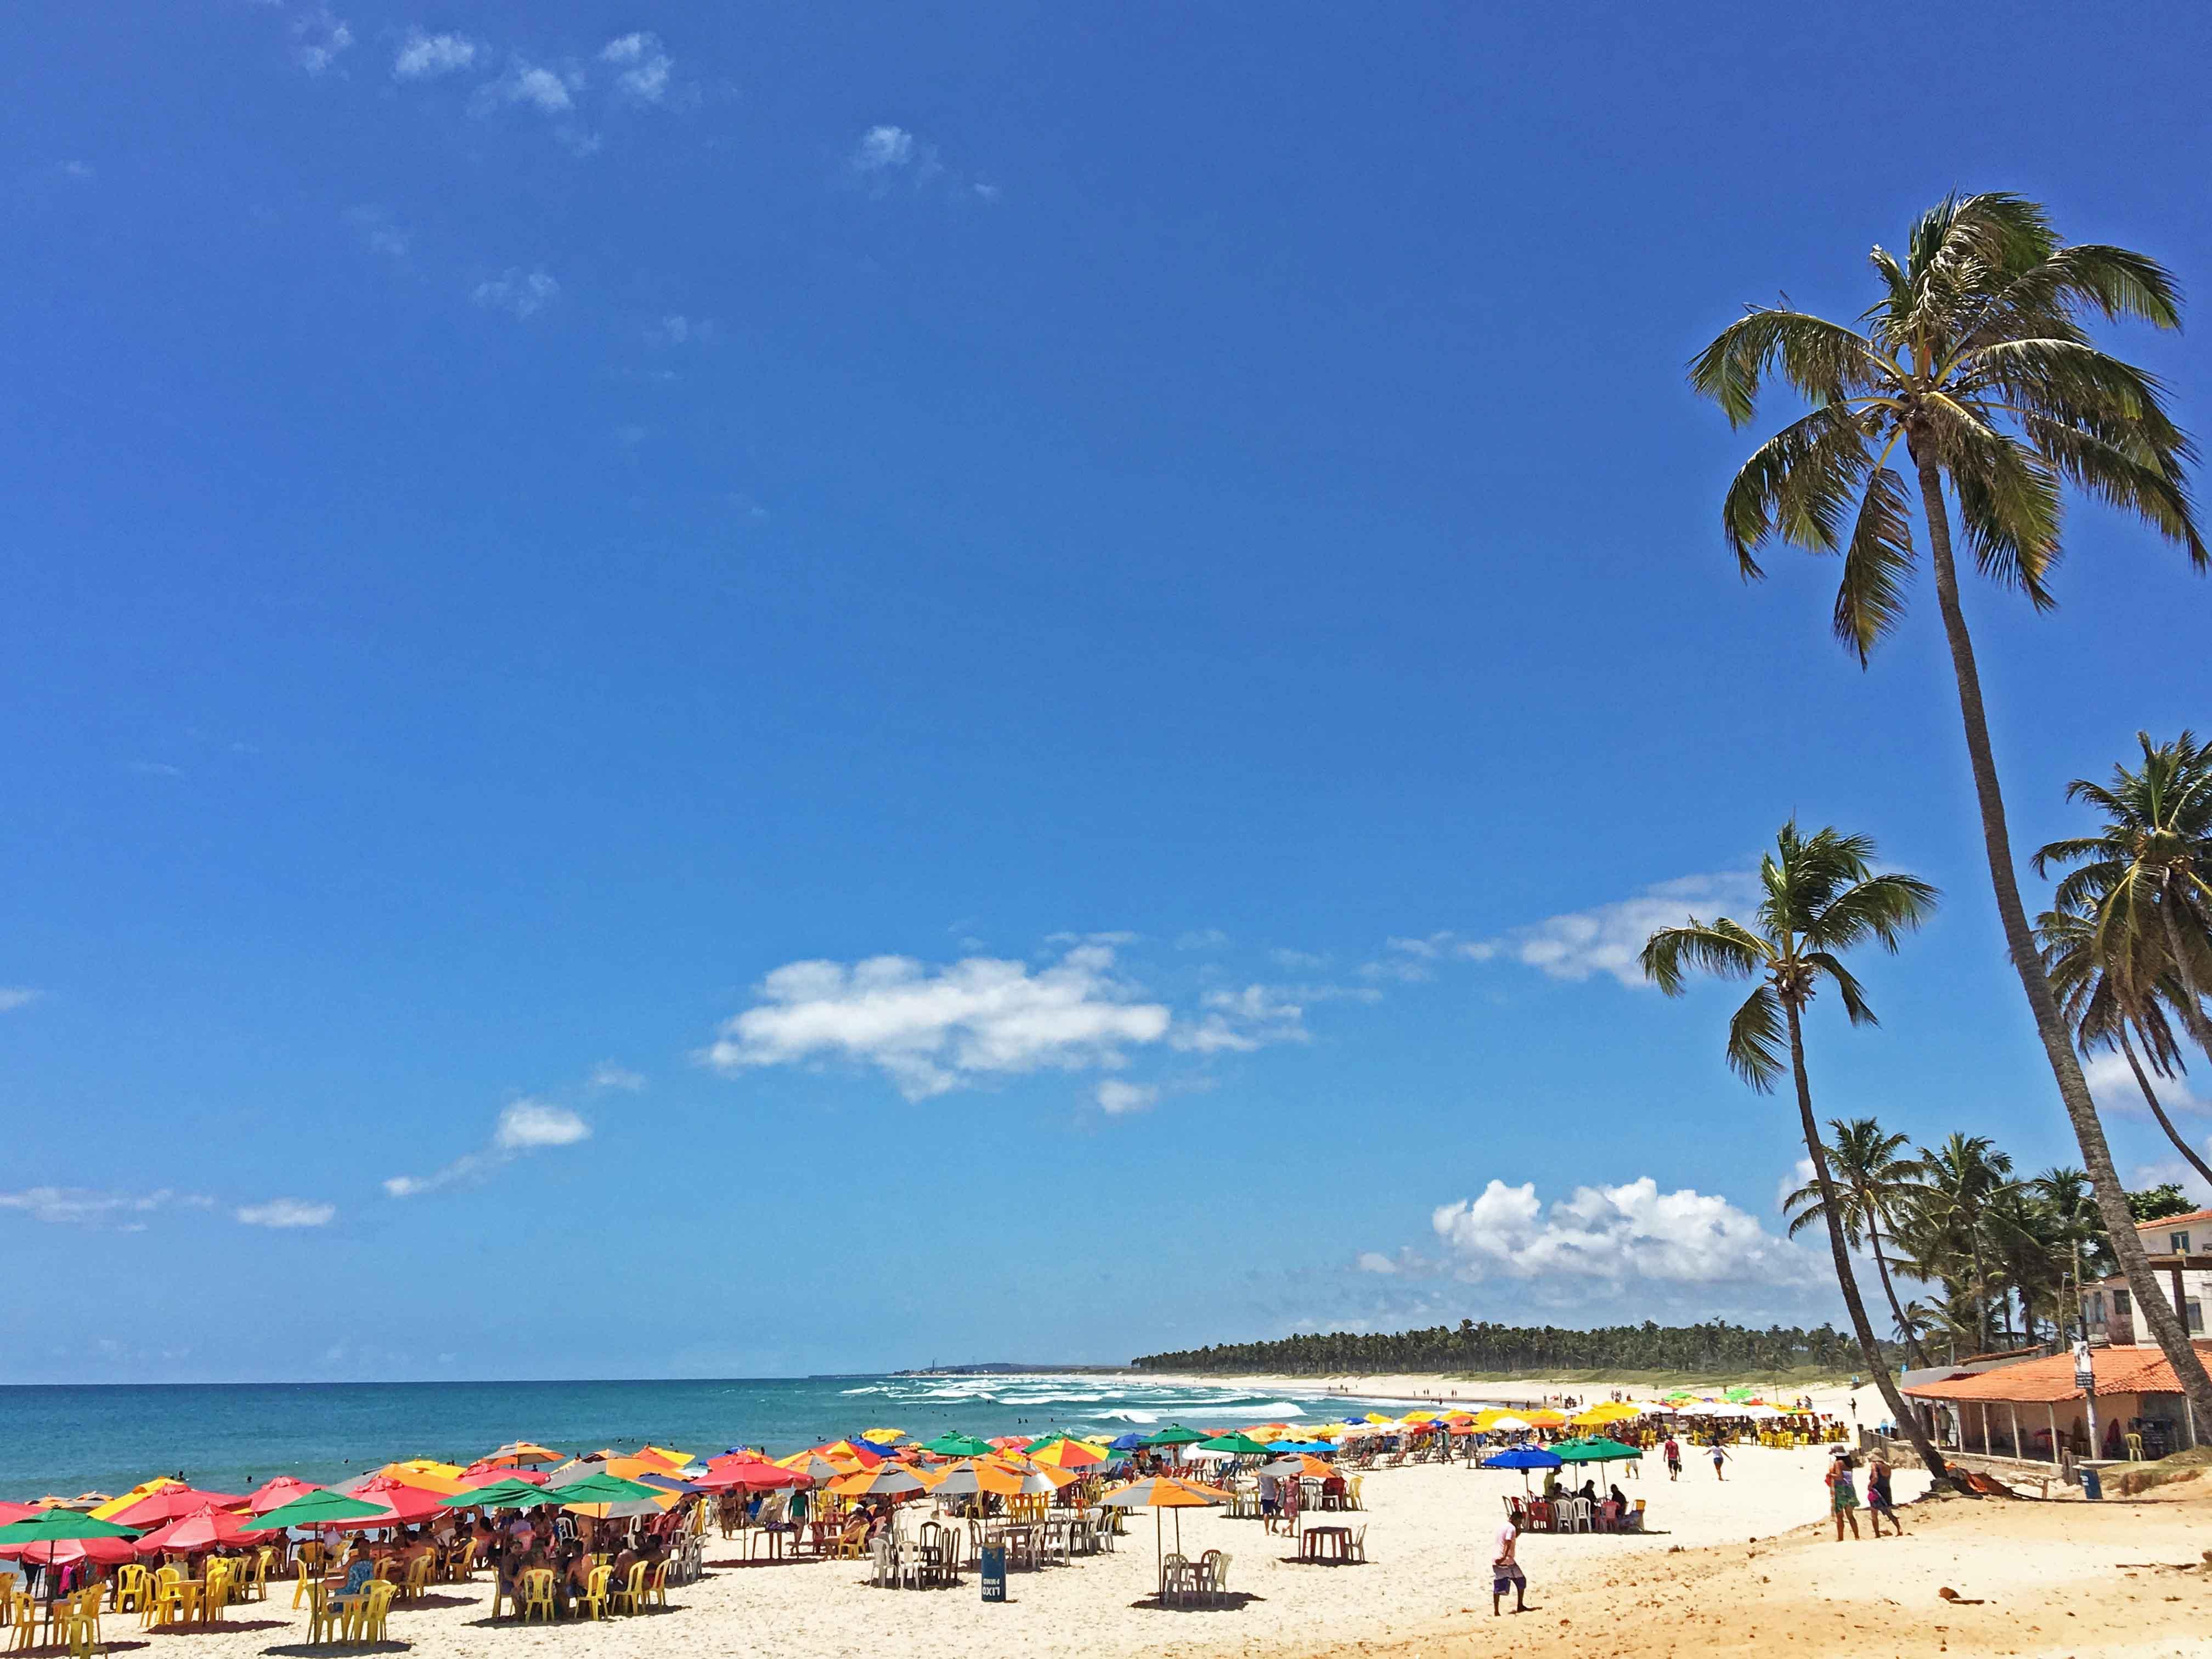 praia do frances alagoas